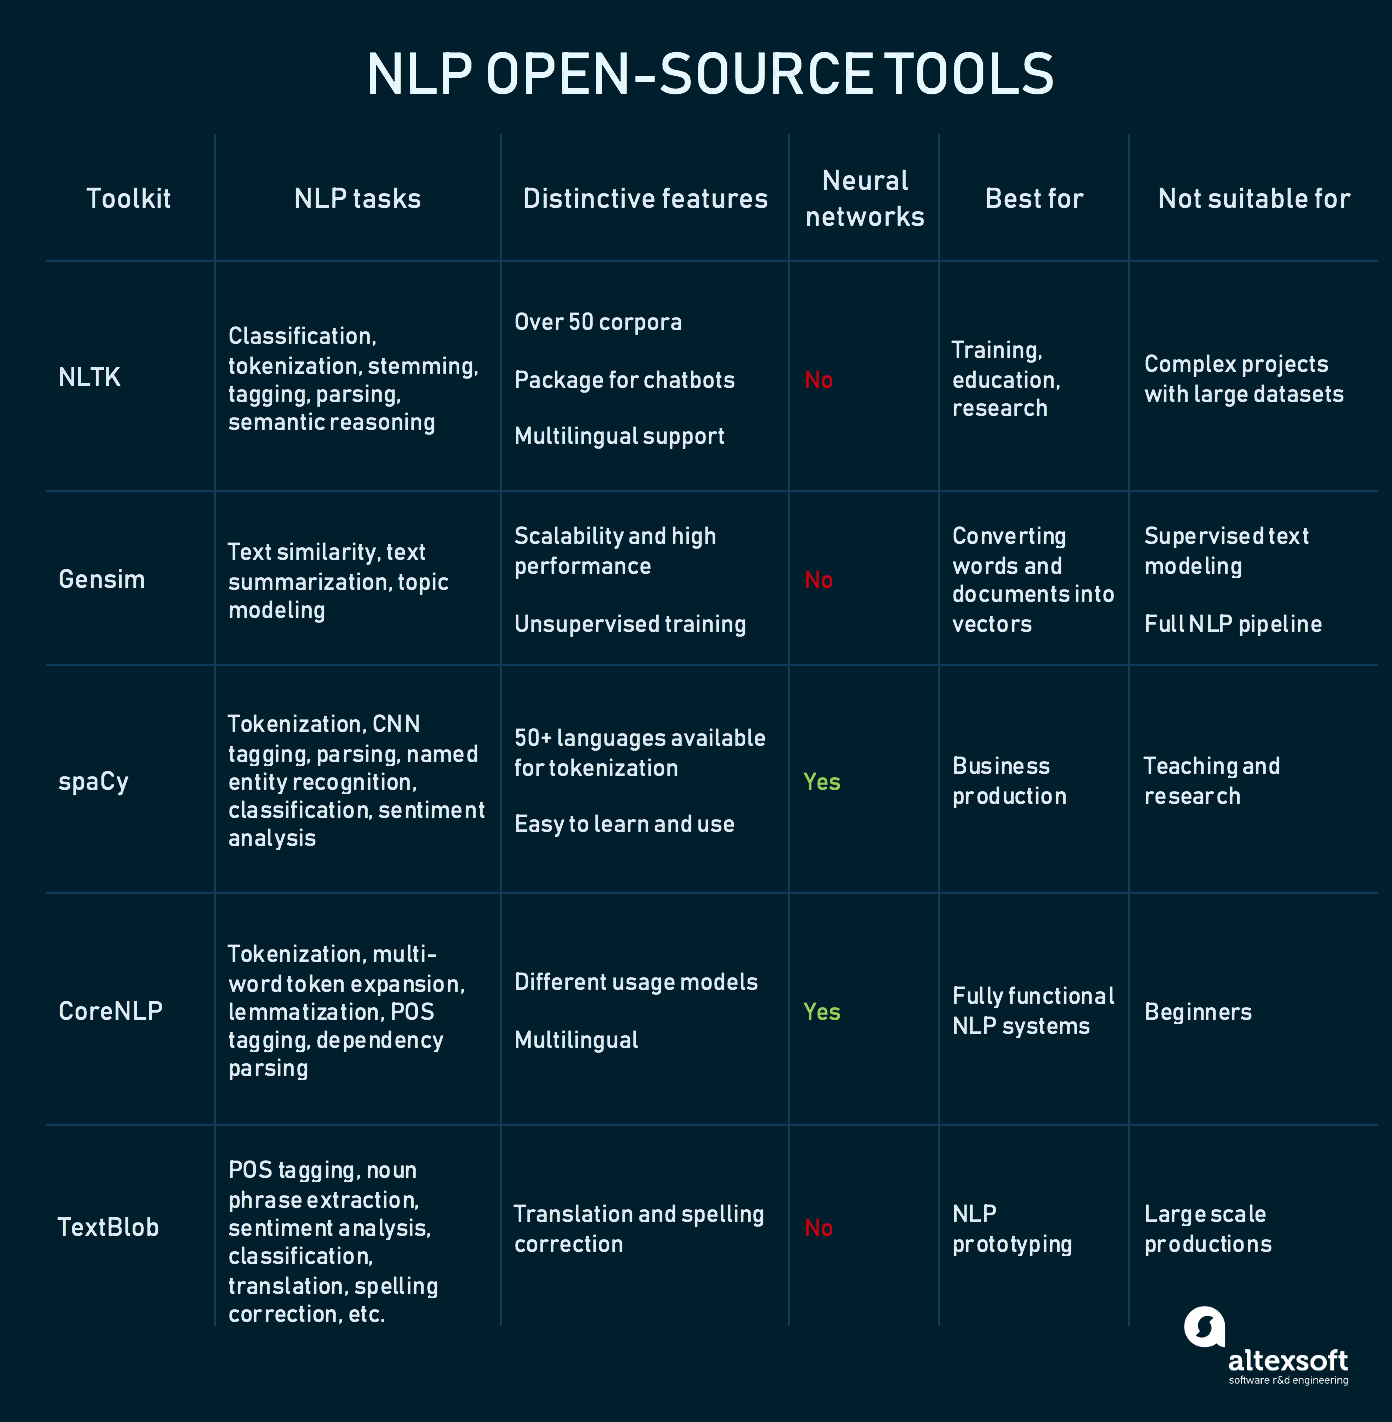 Comparing popular open-source NLP tools